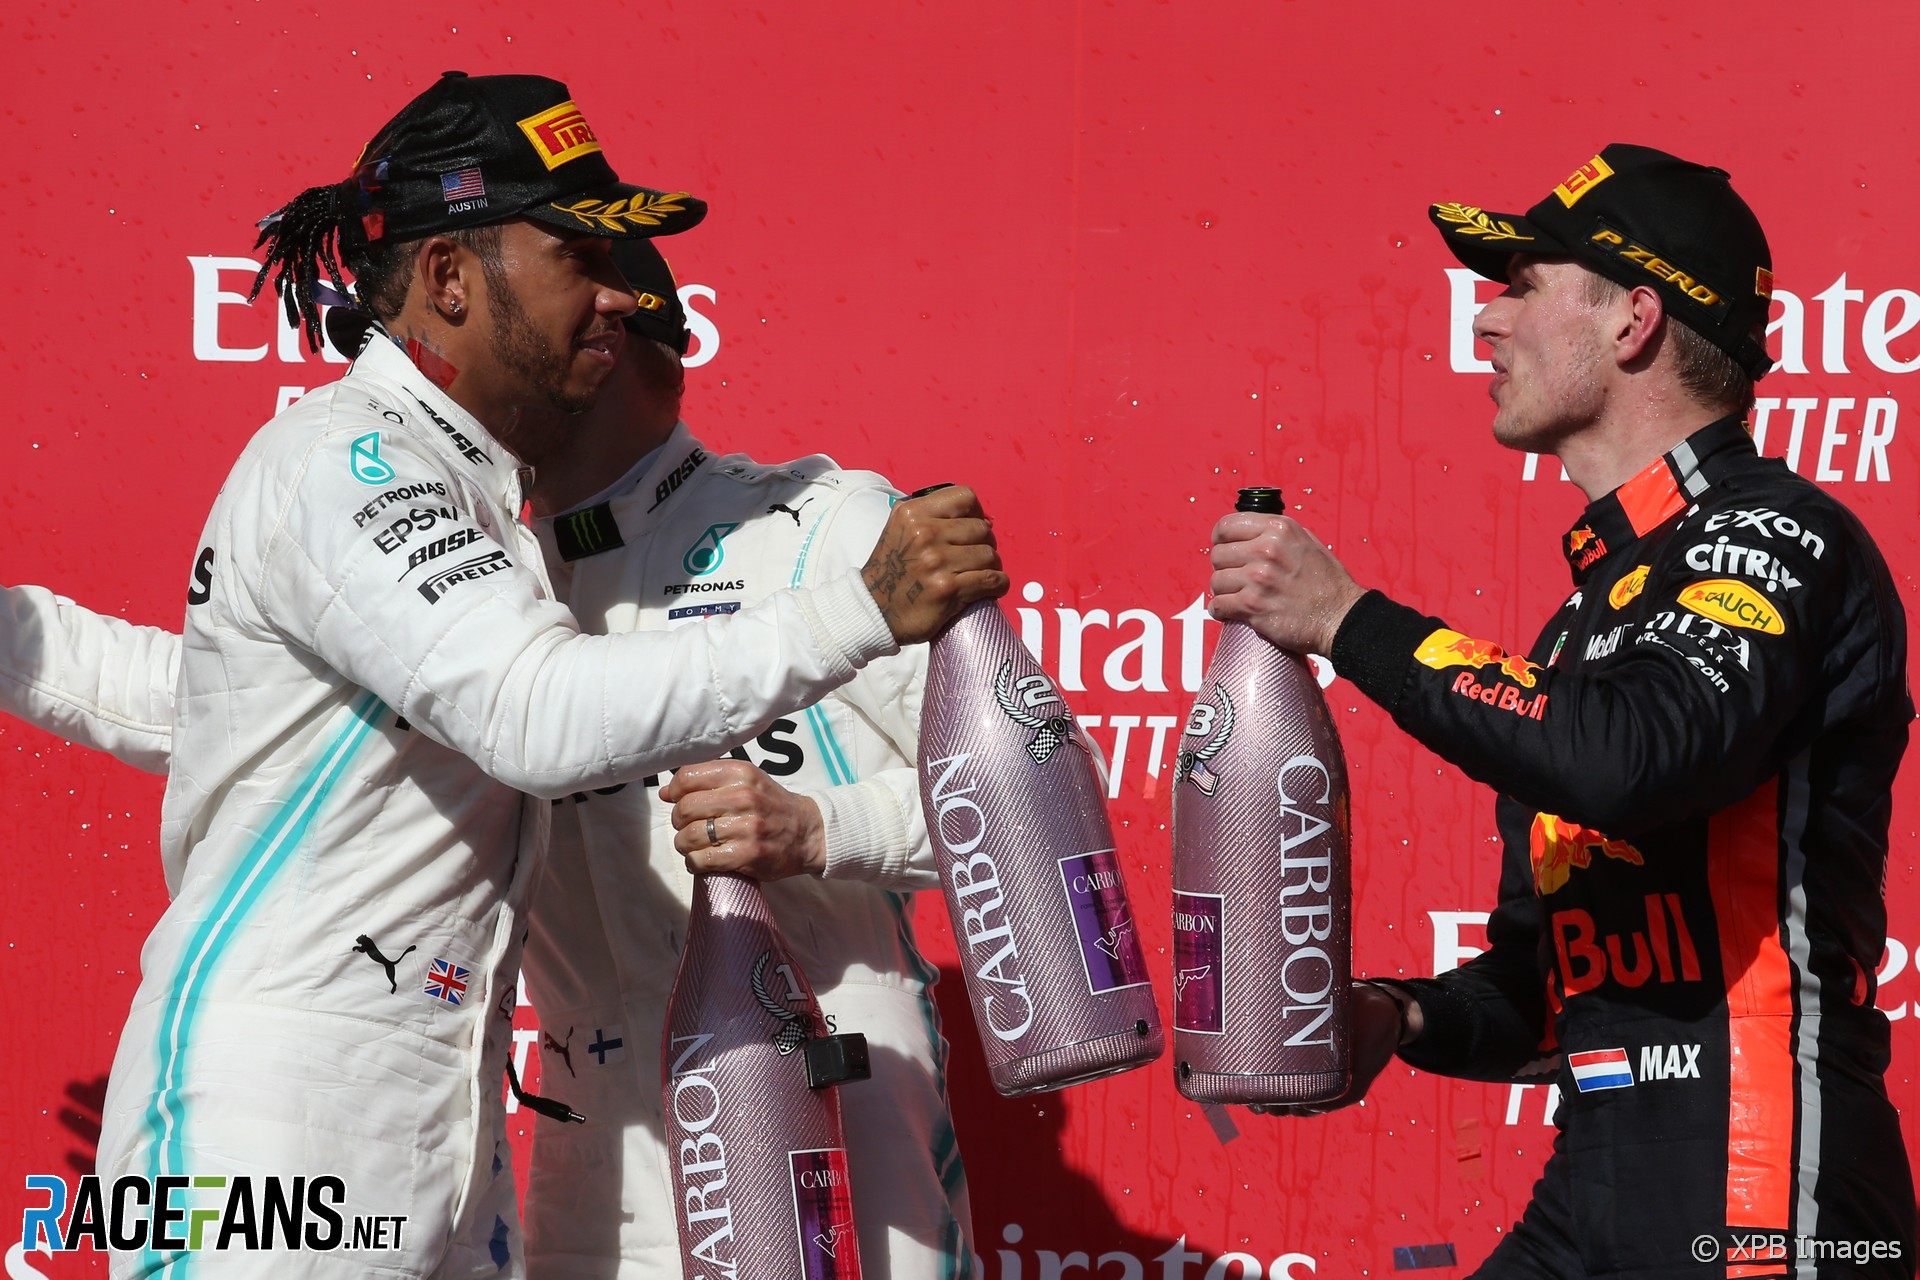 Lewis Hamilton, Max Verstappen, Circuit of the Americas, 2019